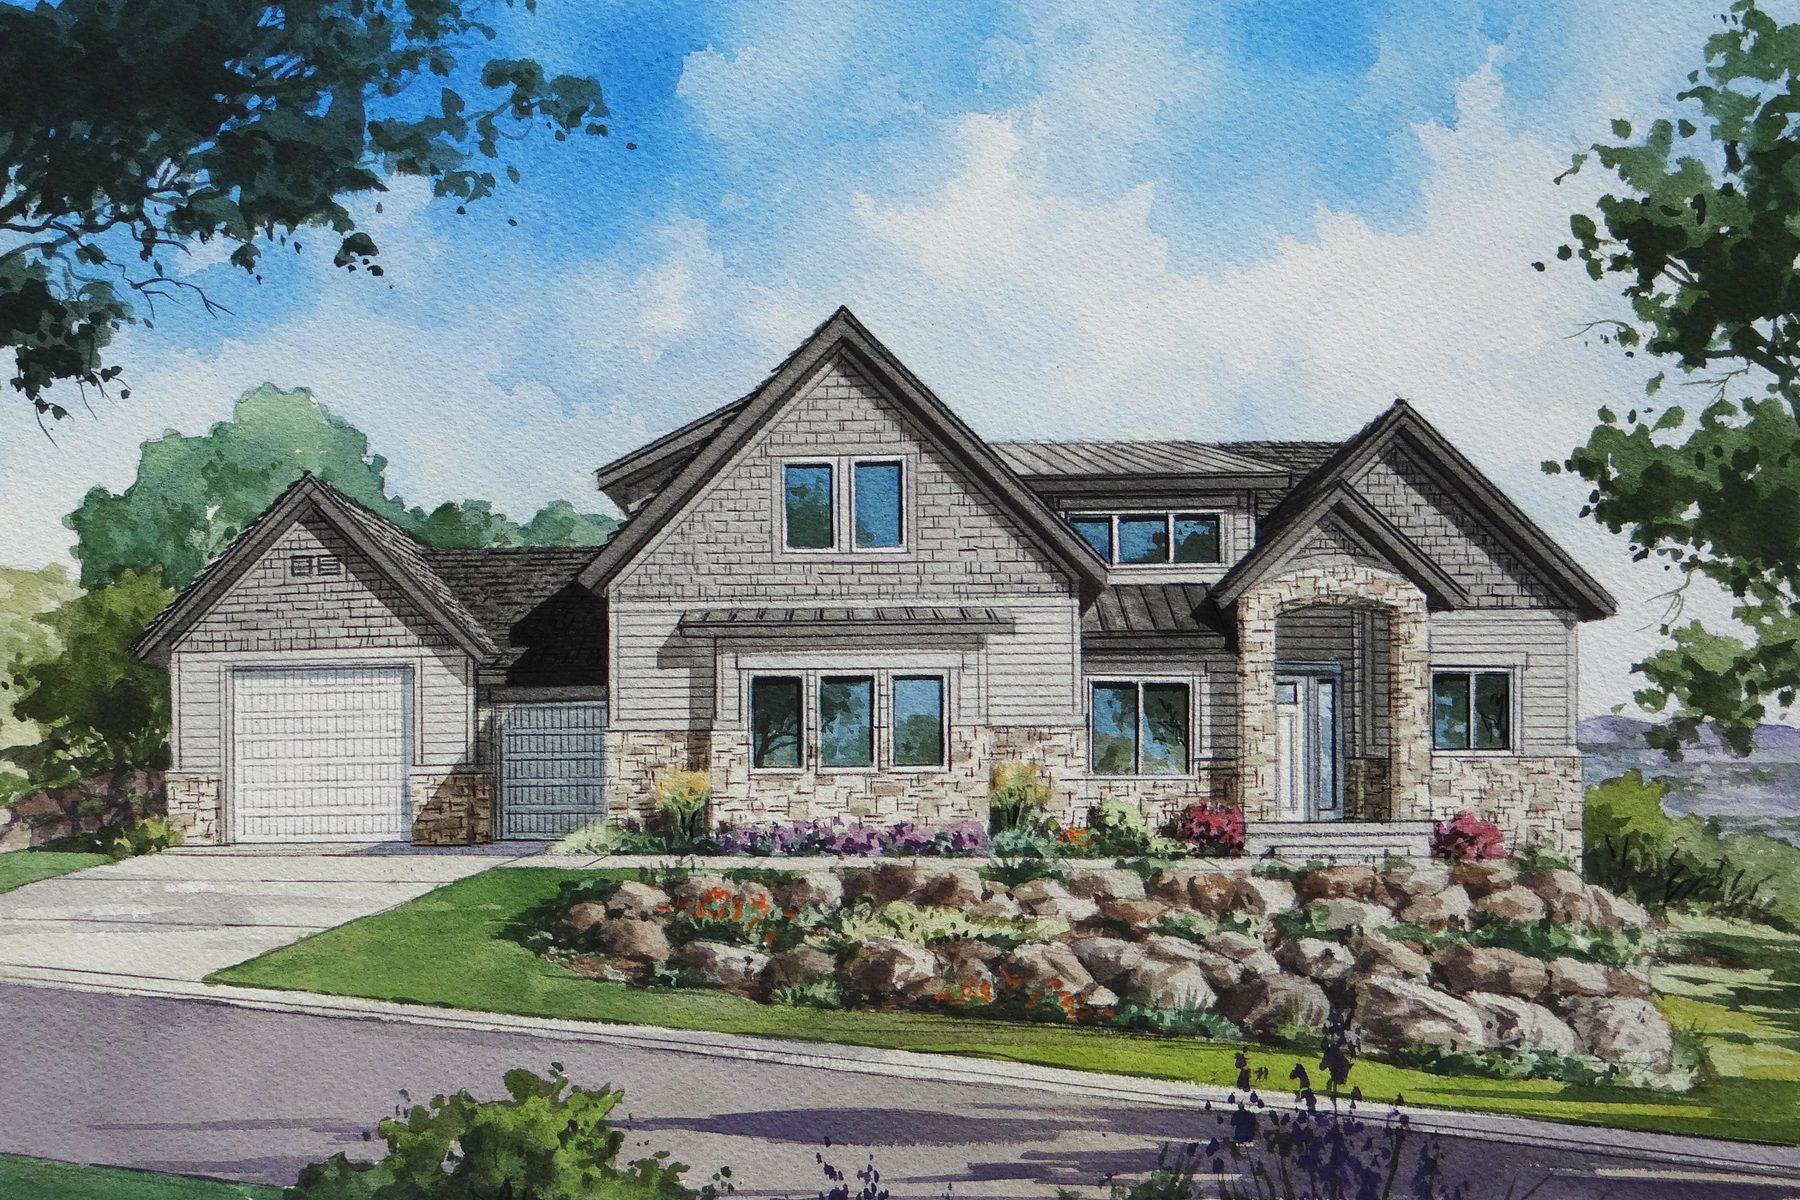 Moradia para Venda às New Custom Home in Steeple Chase 1836 E Aintree Ave Draper, Utah 84020 Estados Unidos